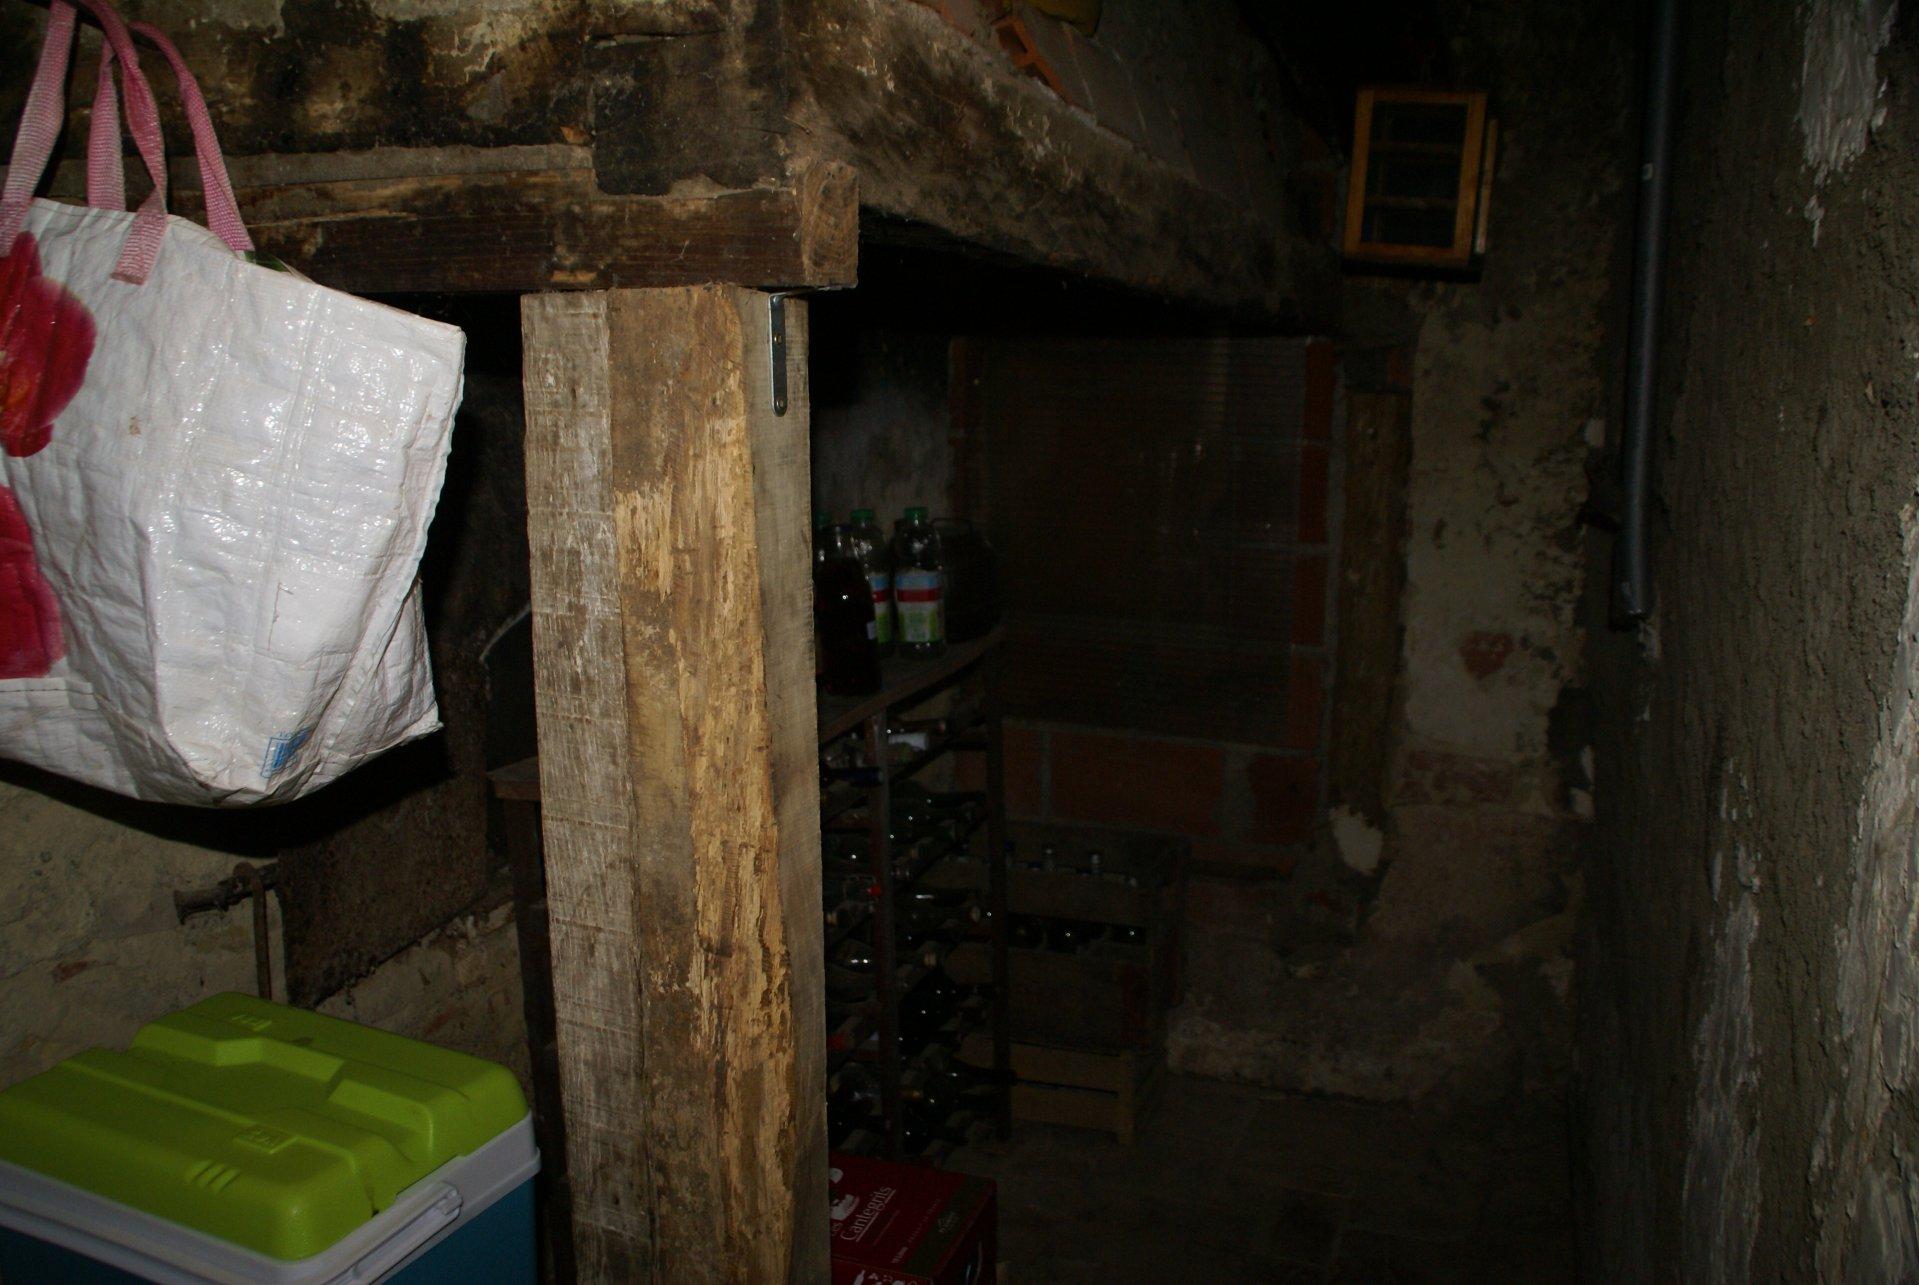 Woonboerderij met veel ruimte, Gers / Midi-Pyreneeën